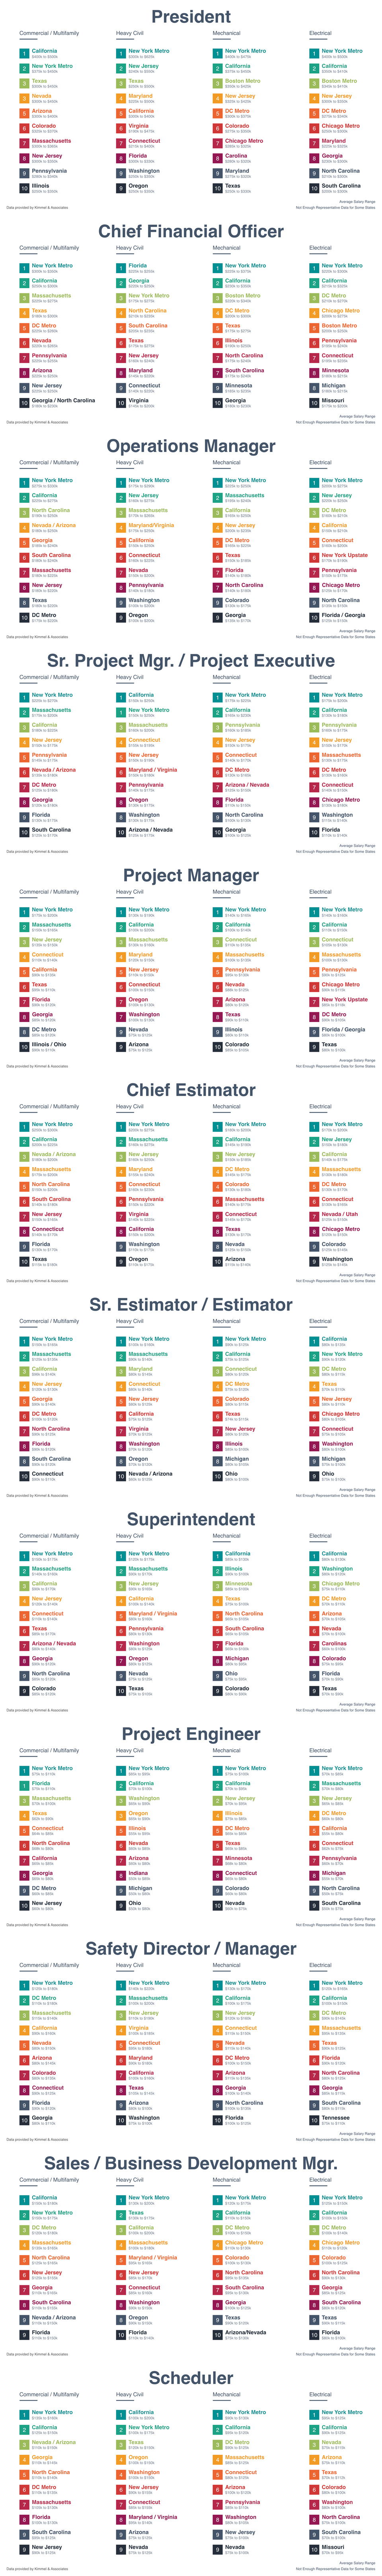 Construction Salary Information